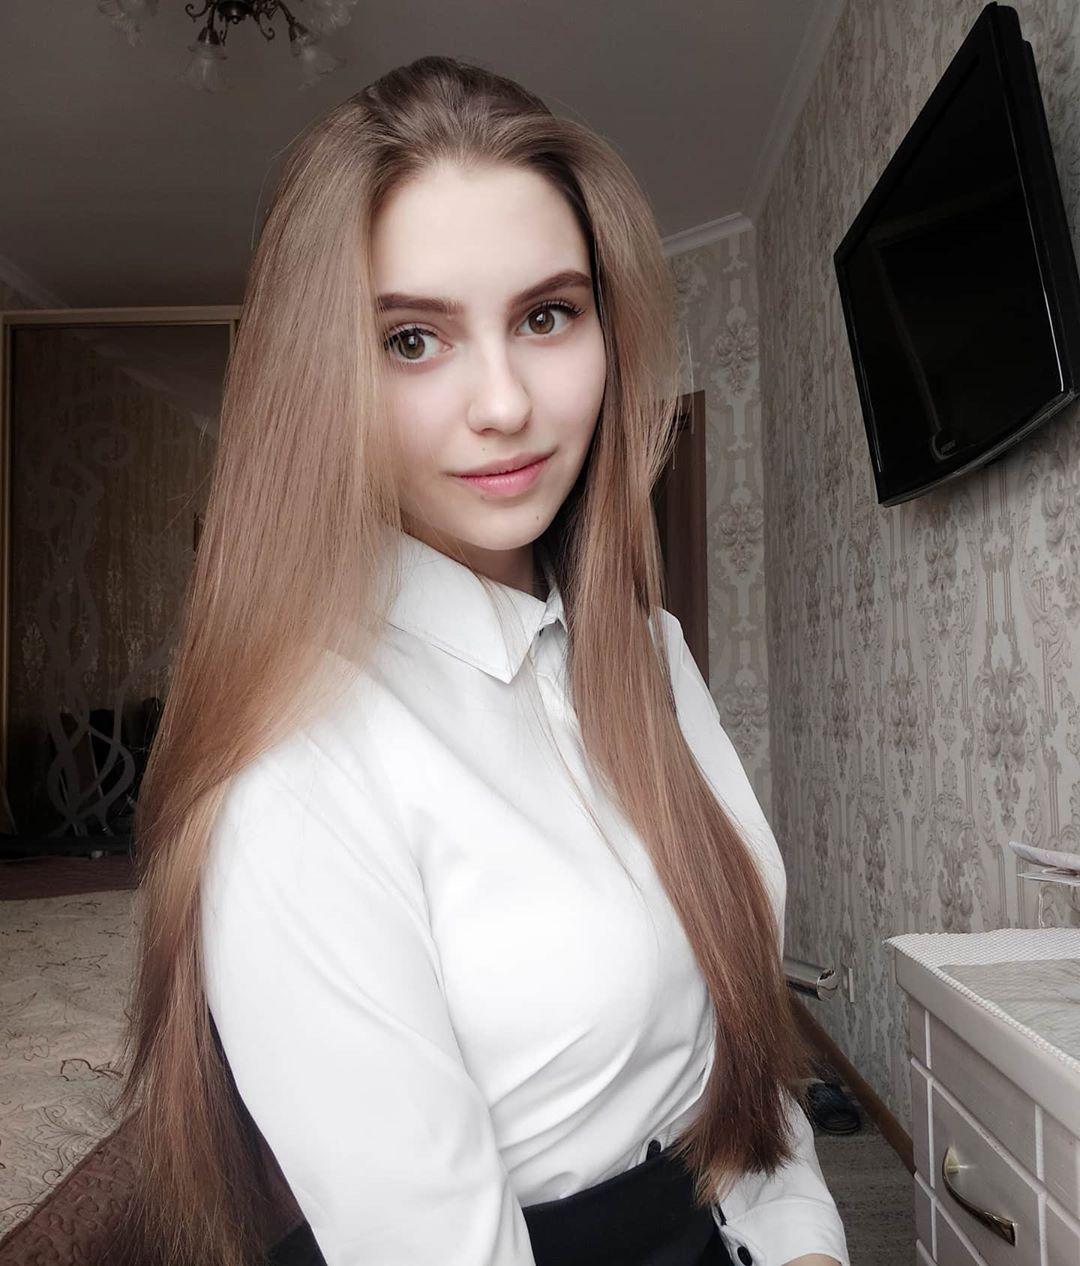 Katya-Melnyk-Wallpapers-Insta-Biography-6